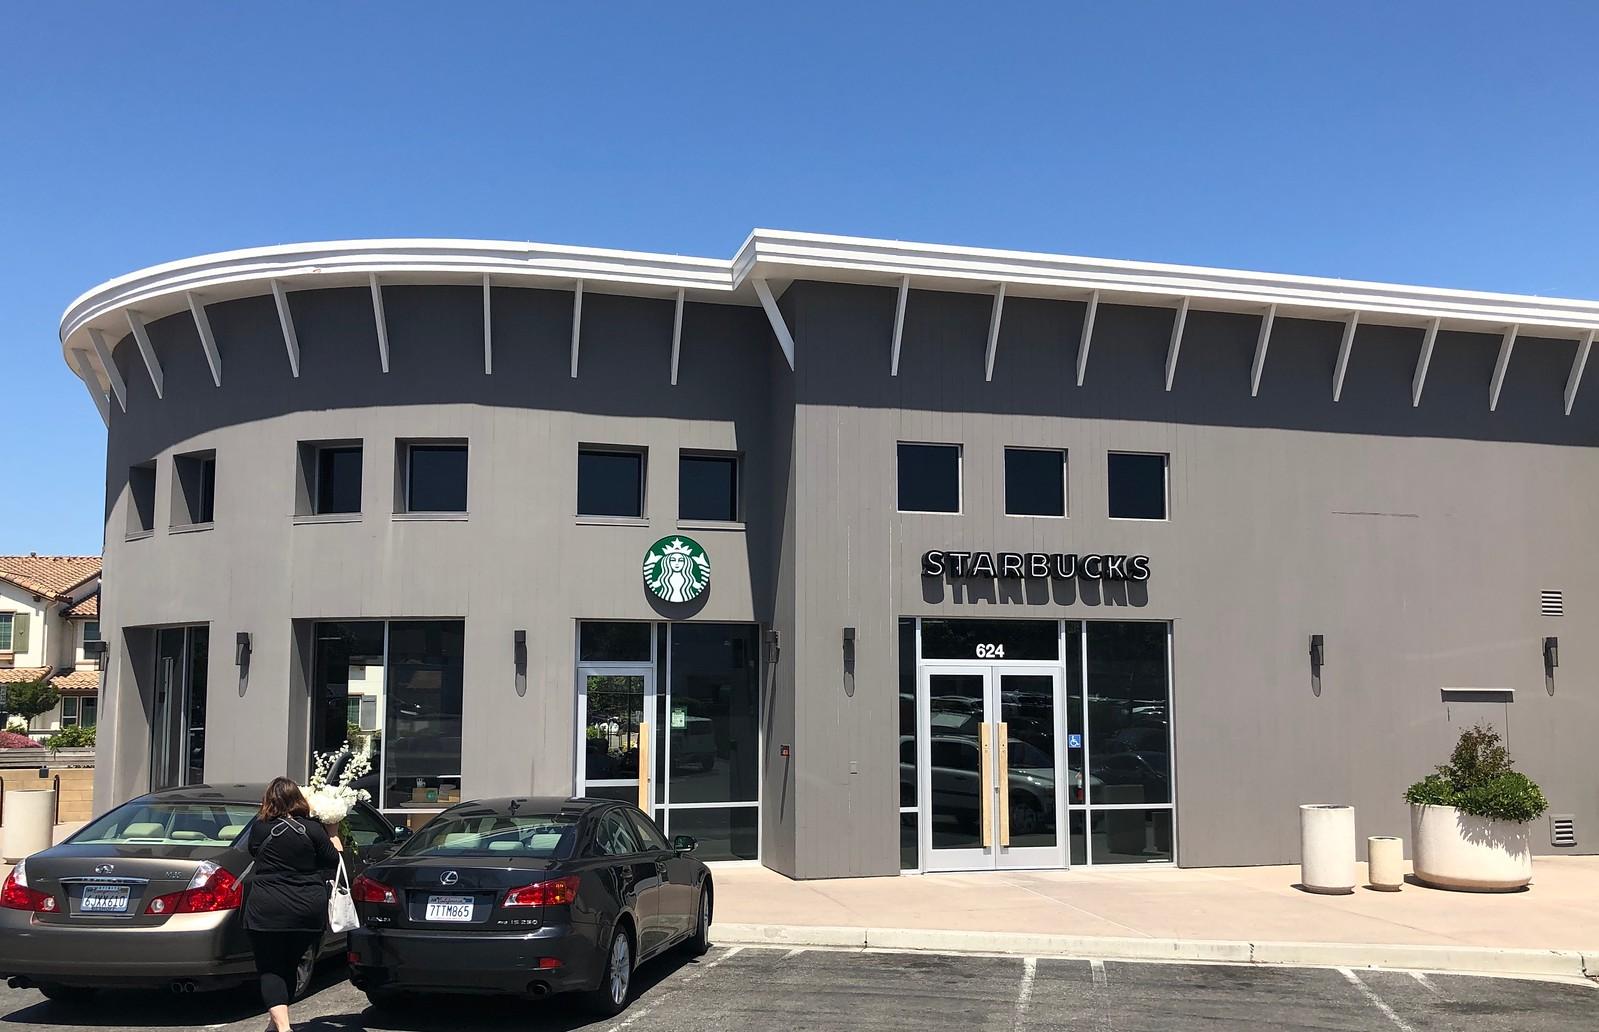 Los Gatos Starbucks.jpg